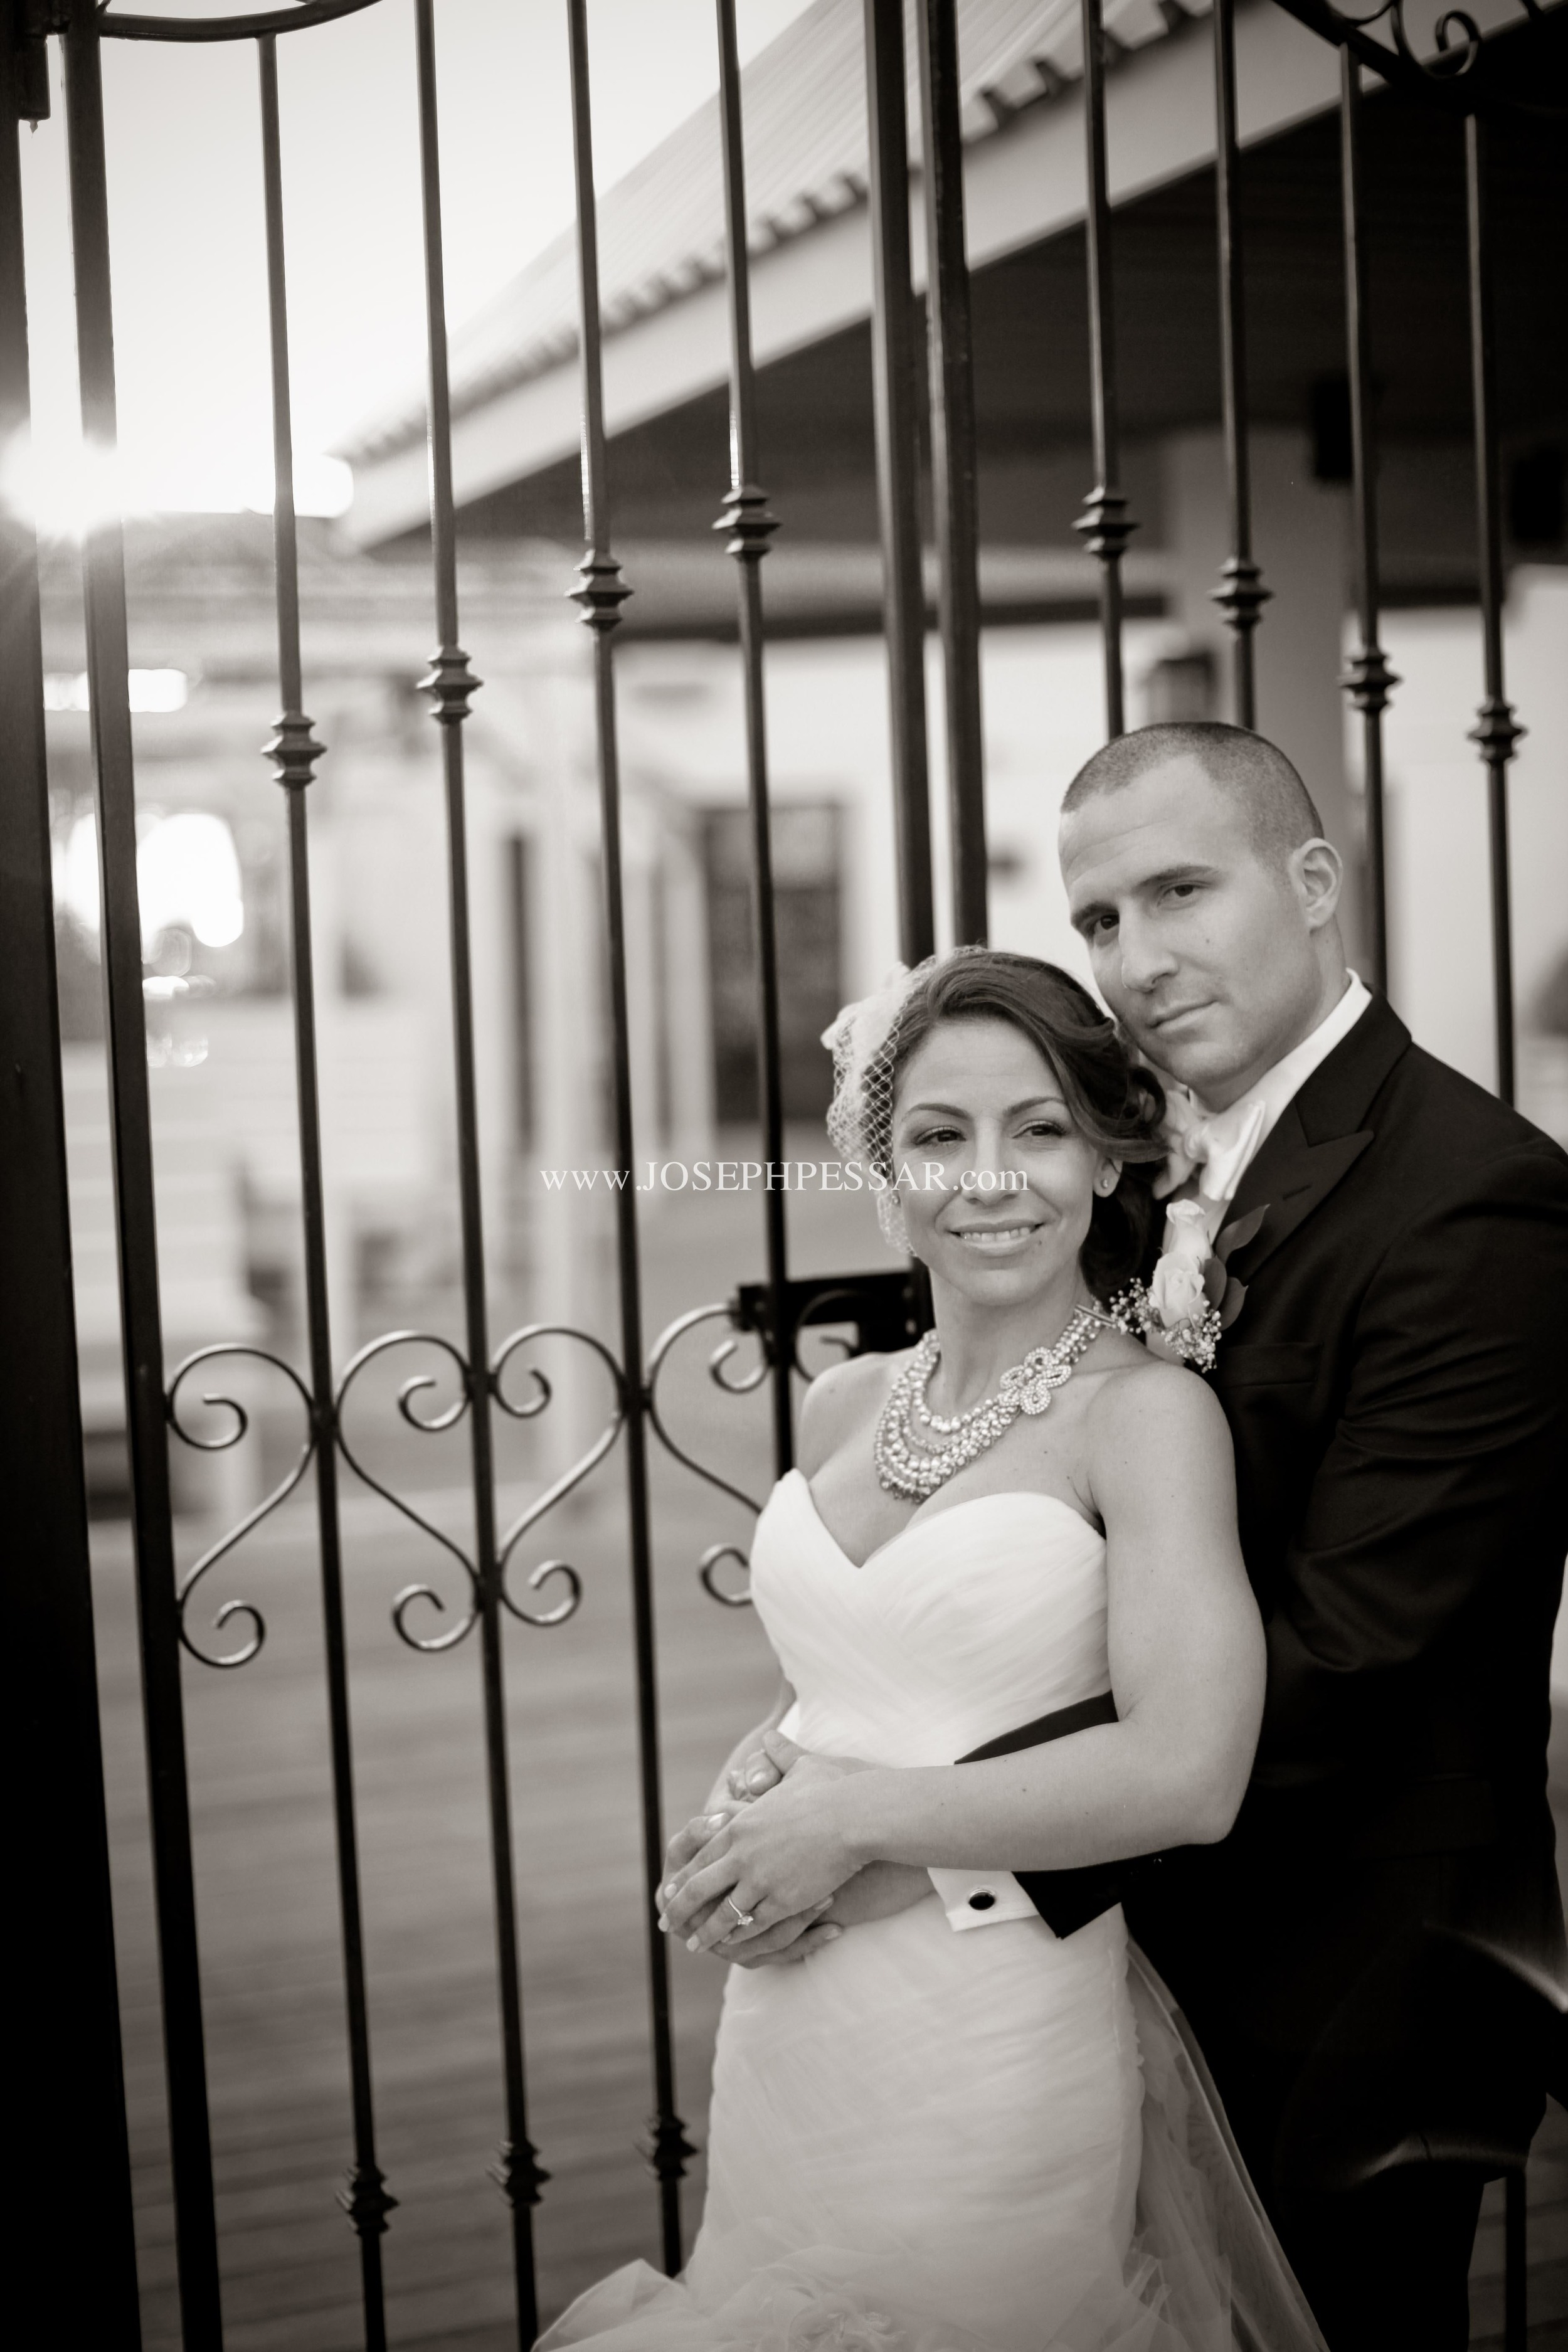 nyc_wedding_photographer0026.jpg